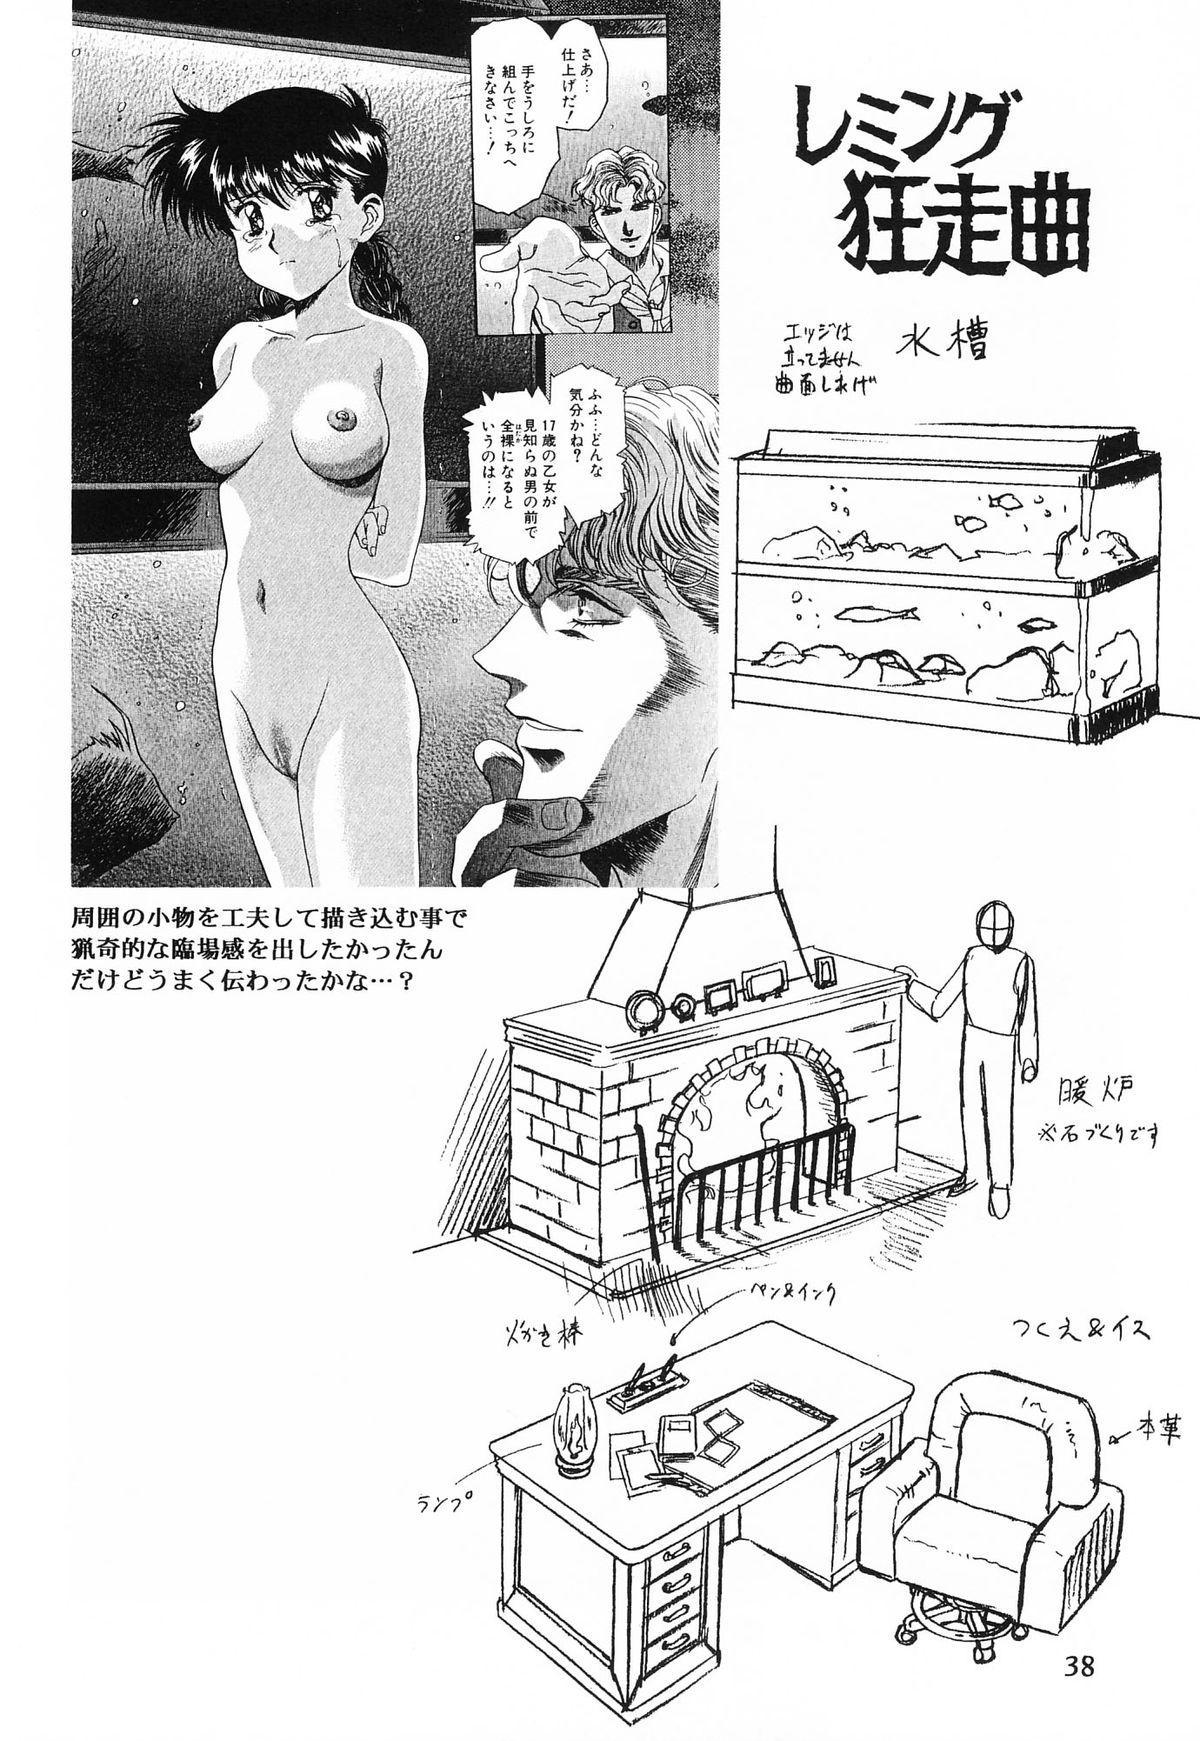 Henrei-kai '98 Natsu SPECIAL 39